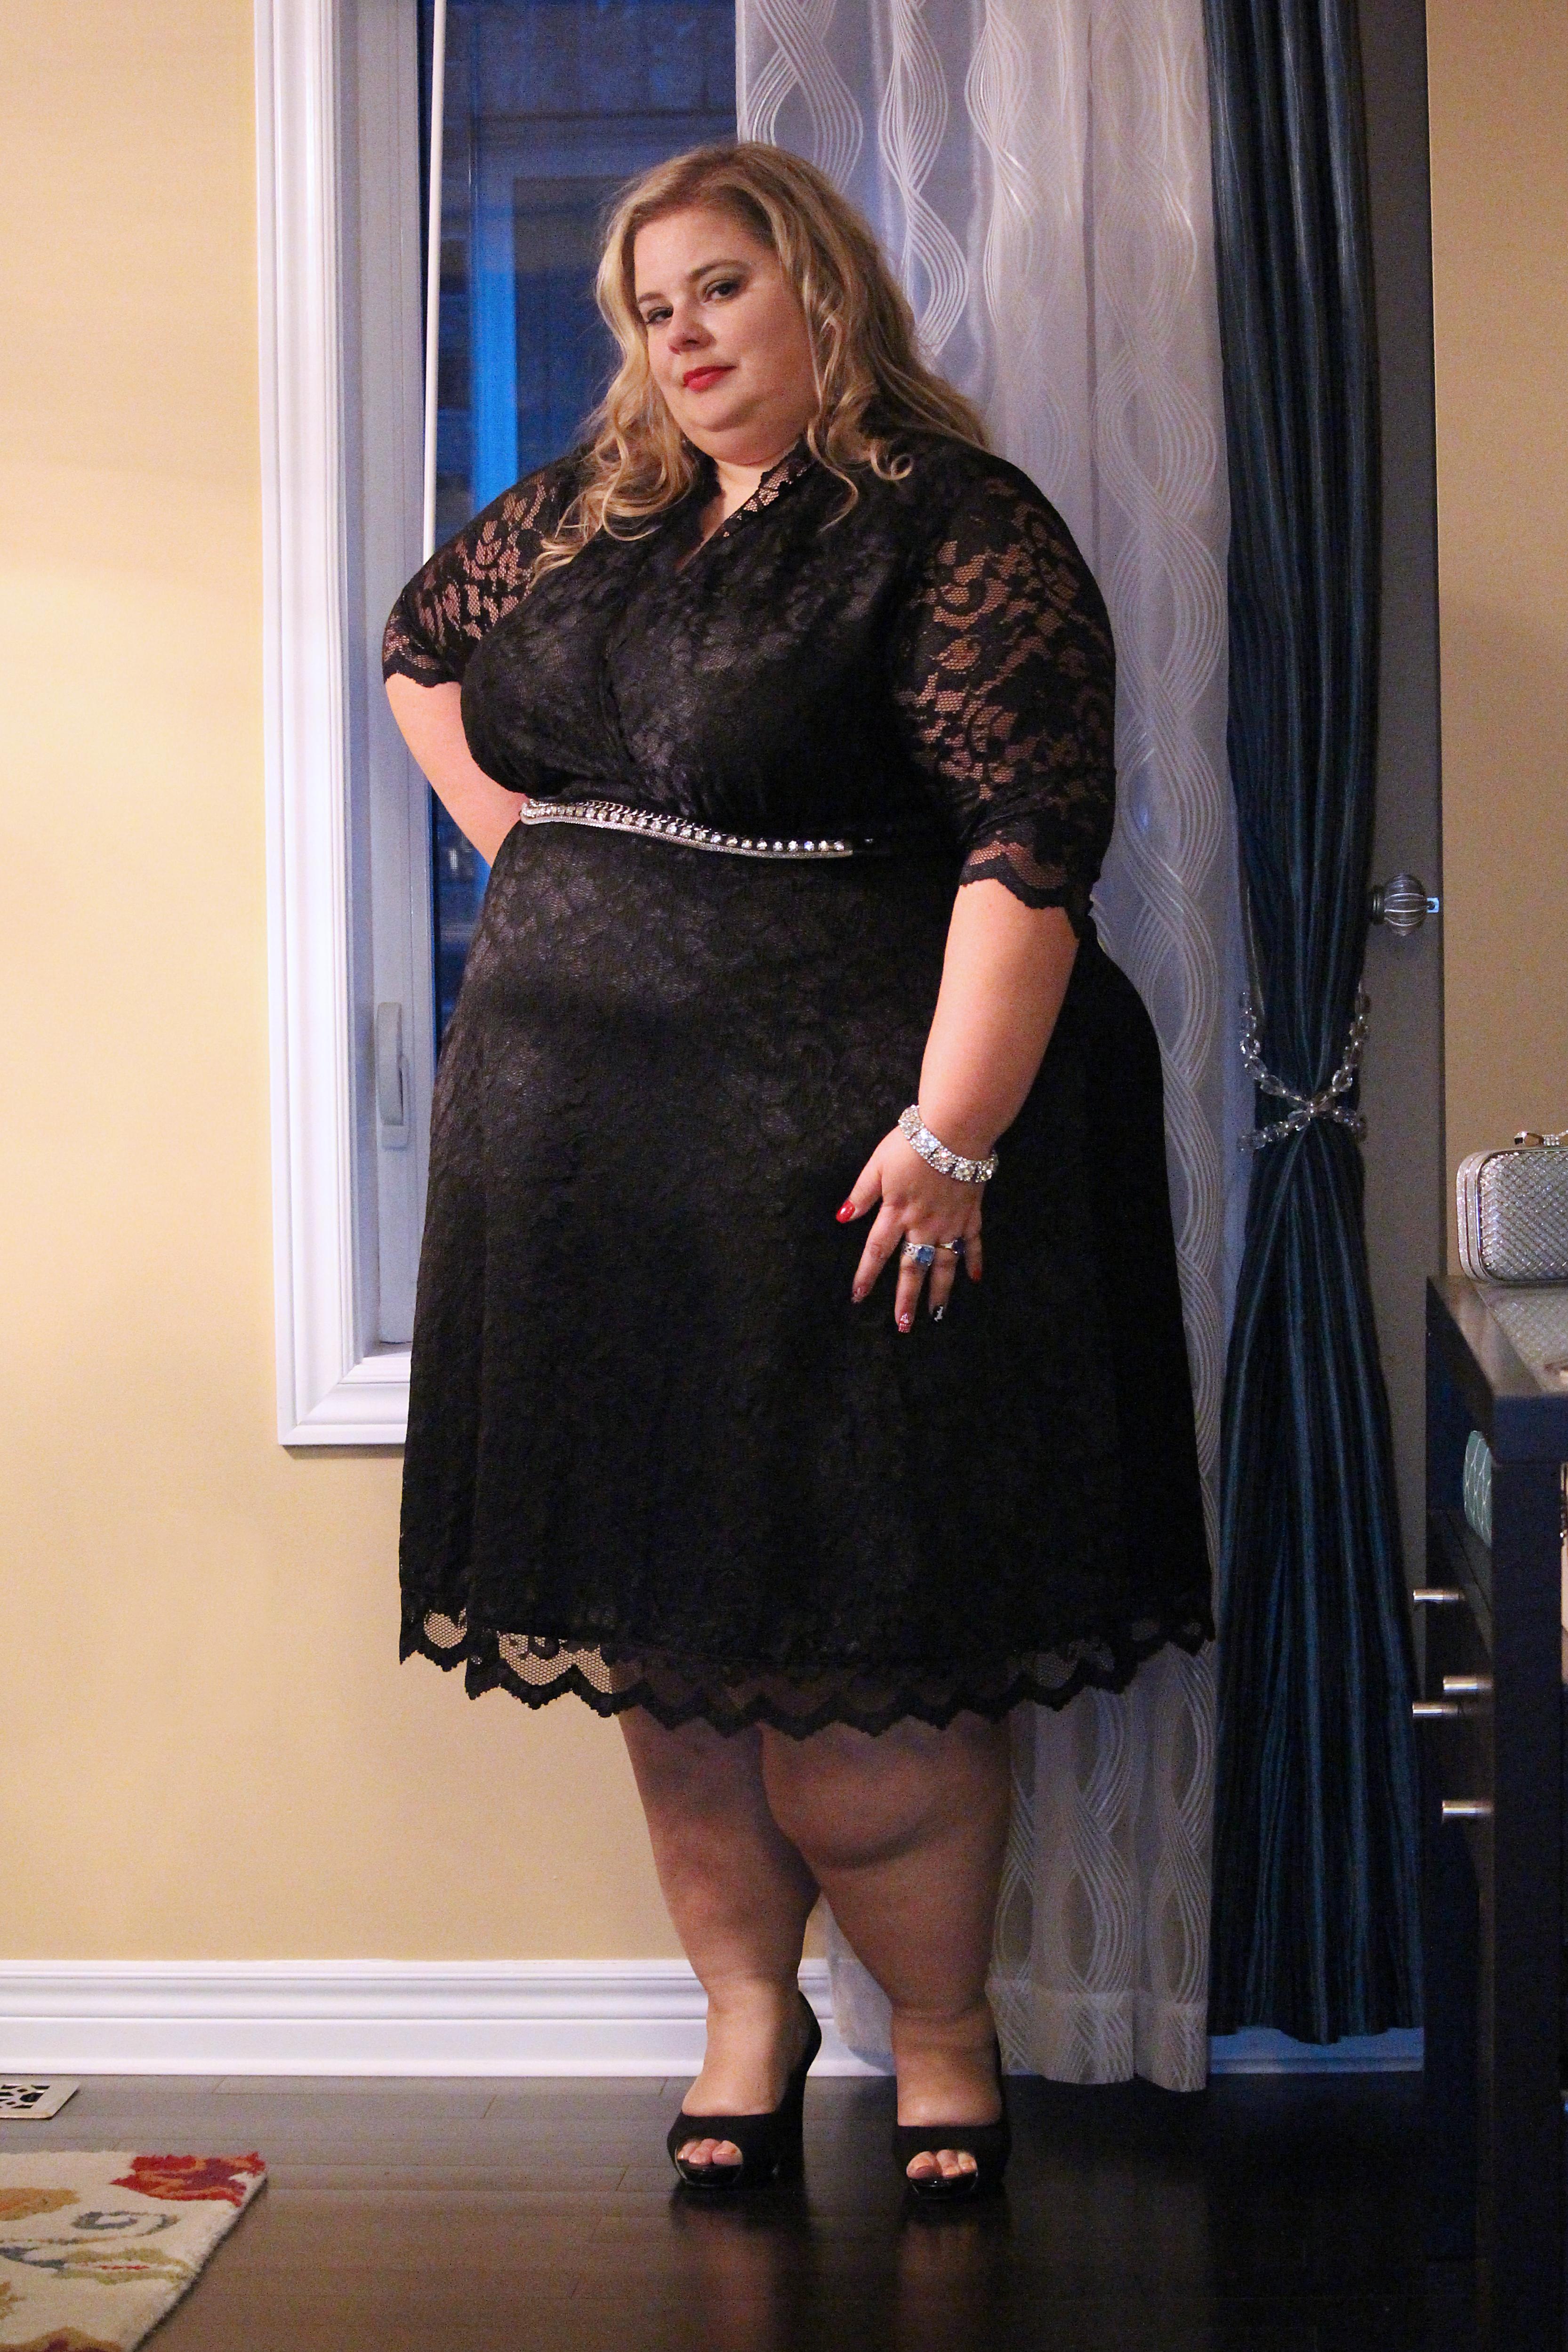 Black bbw getting dressed